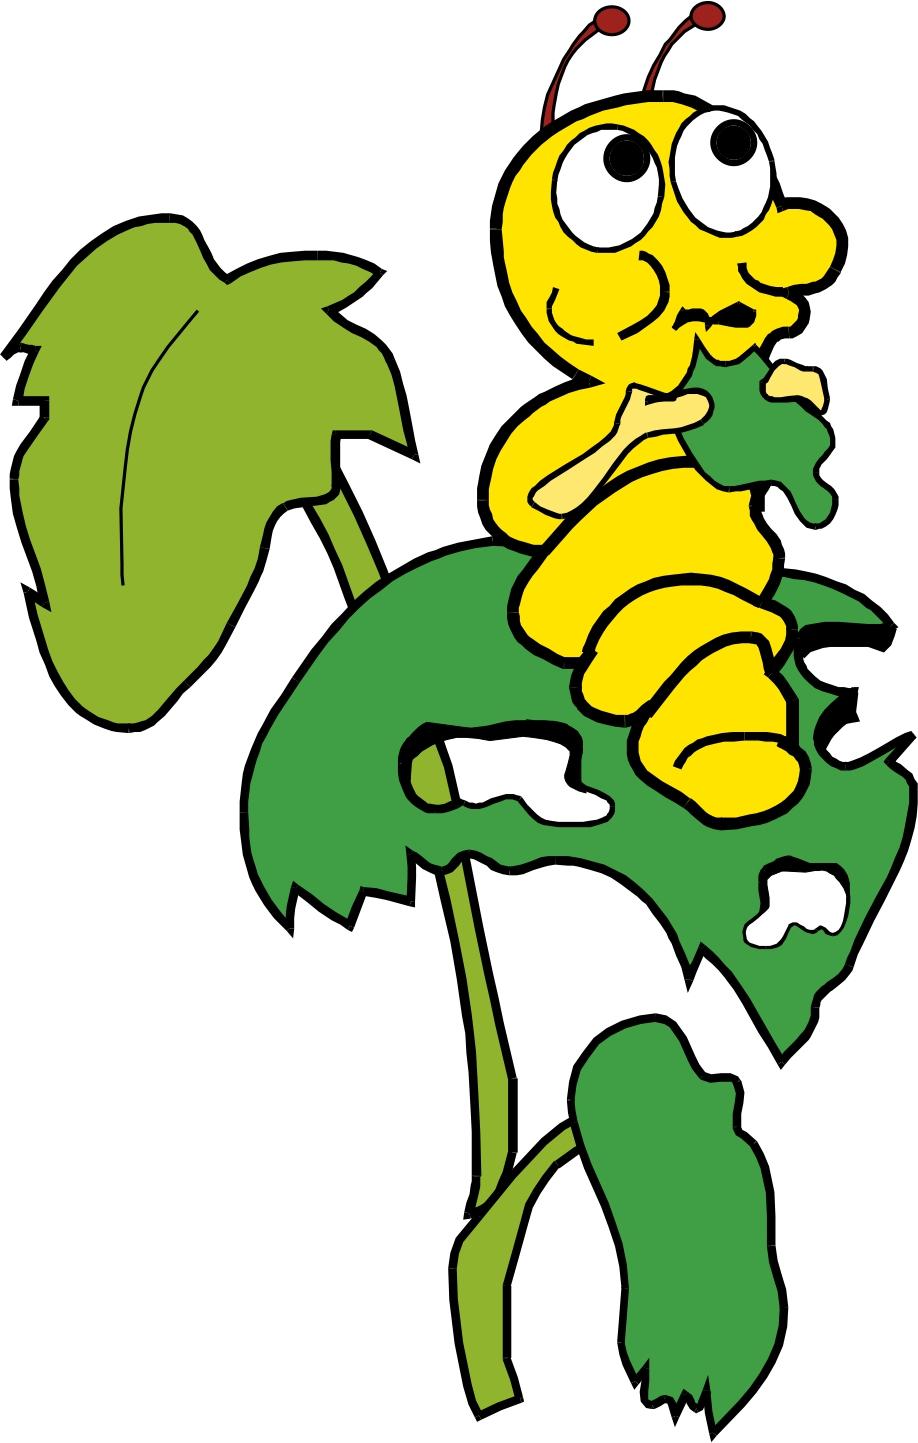 cartoon worms clip art - photo #13